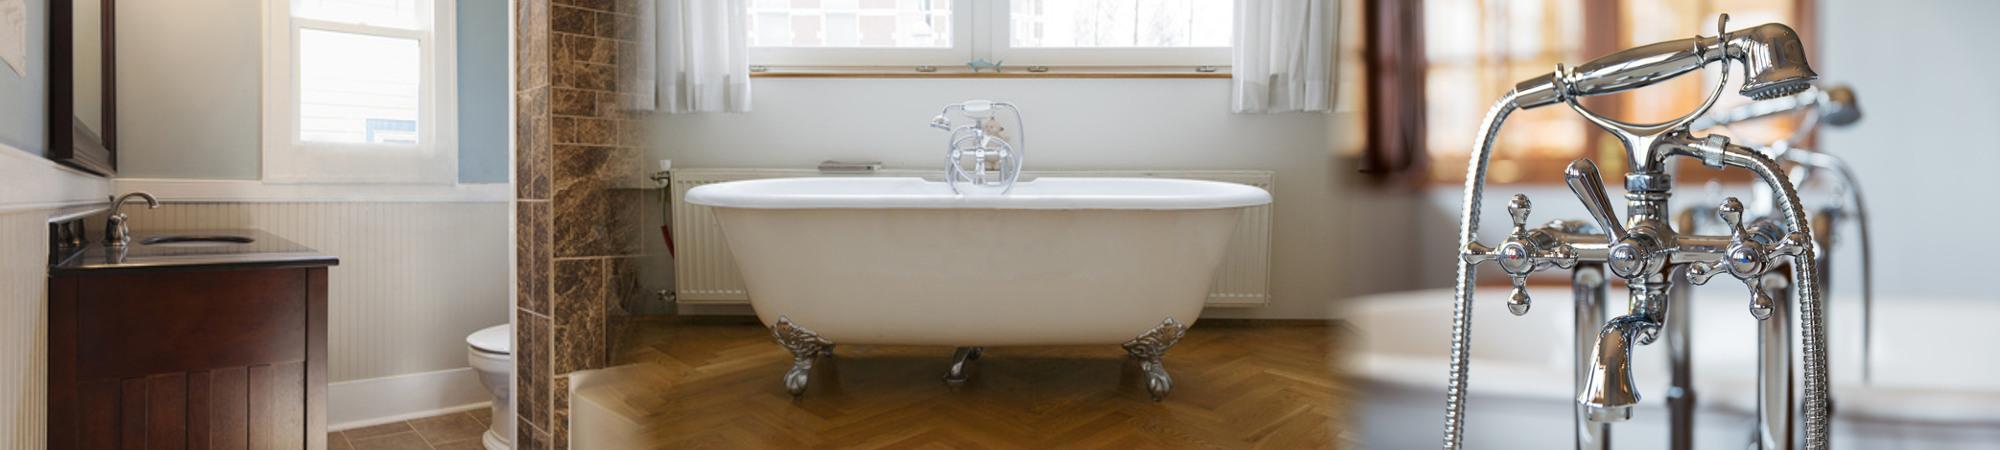 slider-plumbing3